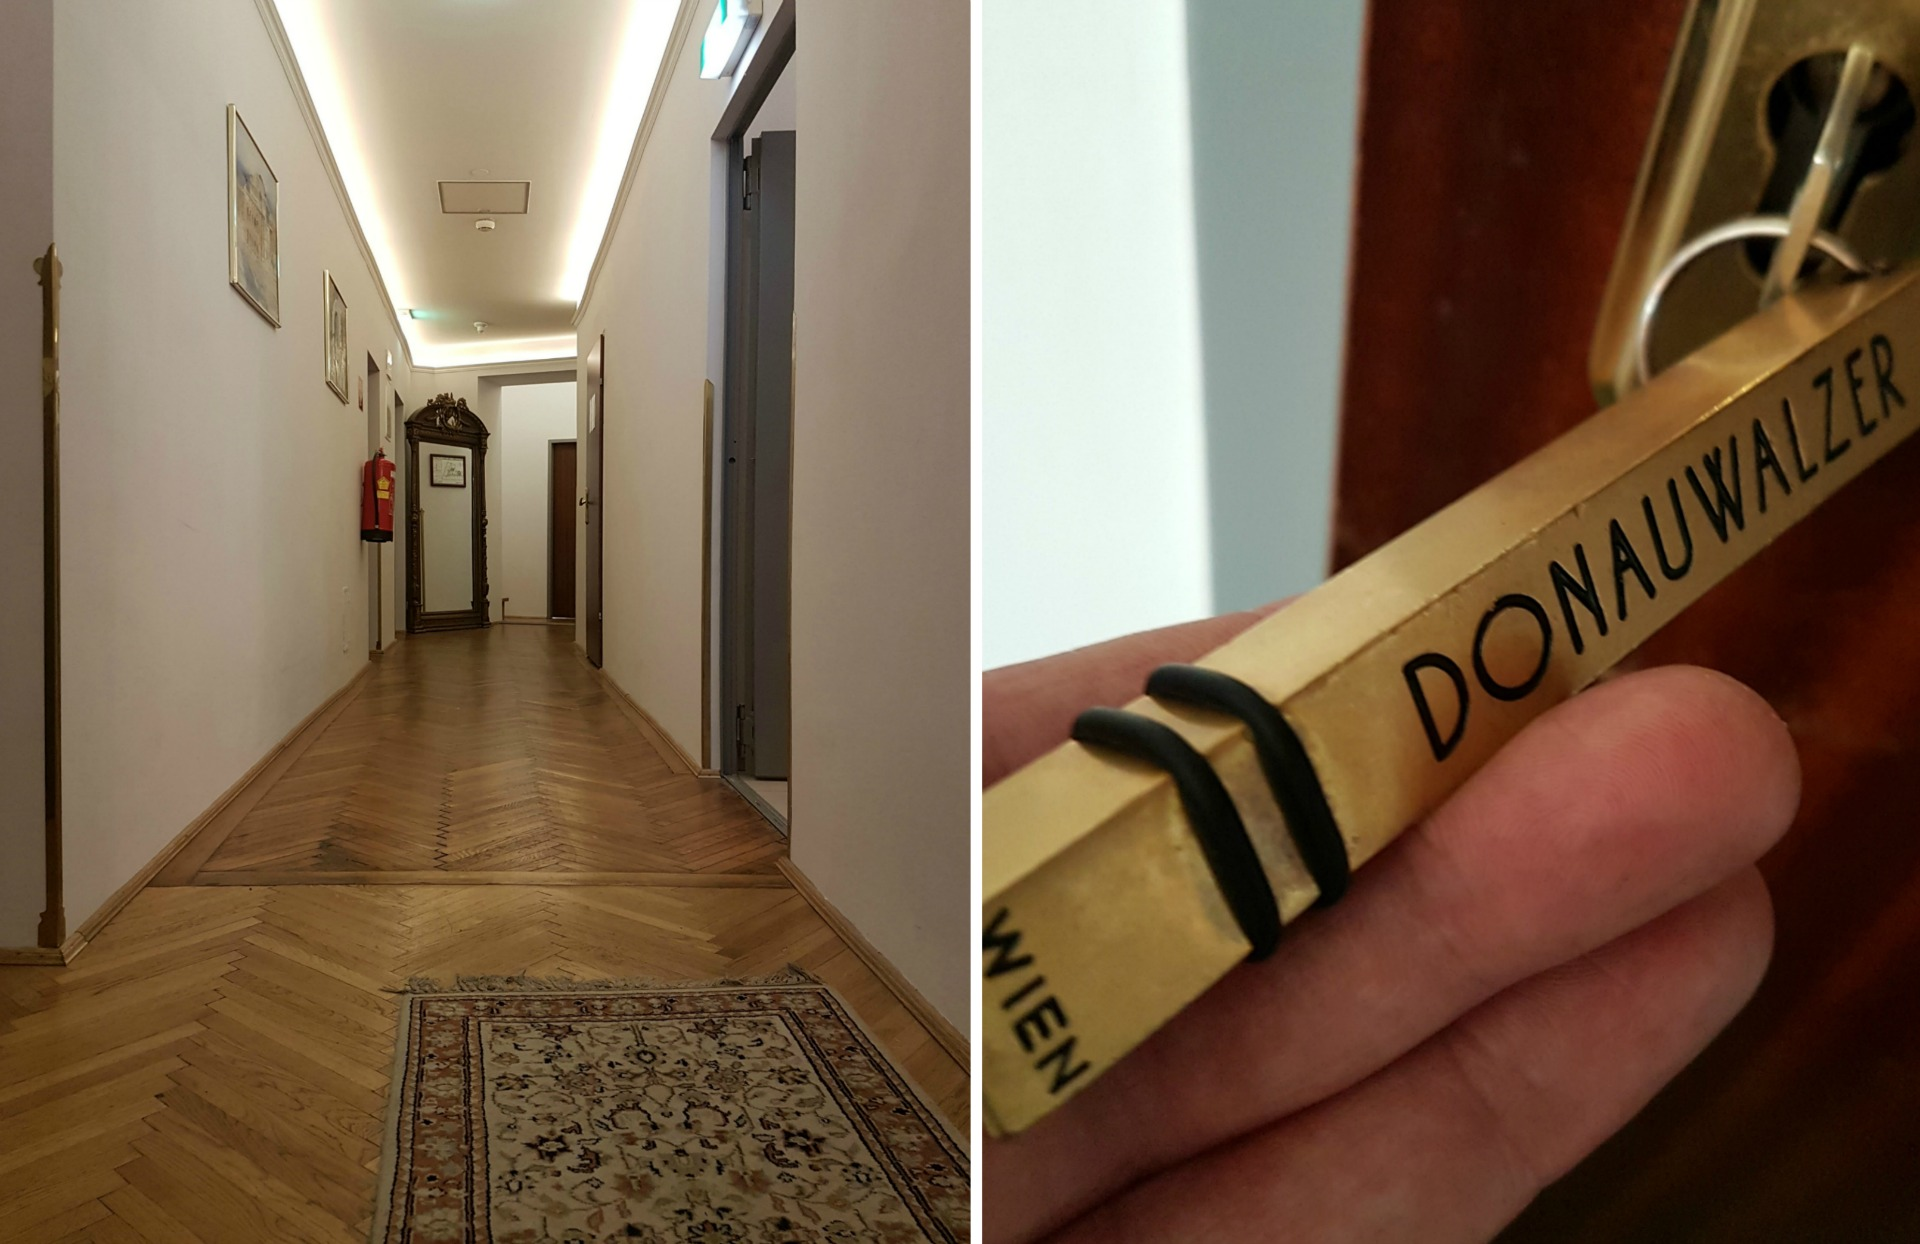 Boutique Hotel Donauwalzer_hallway_orginal_flooring_roomkey